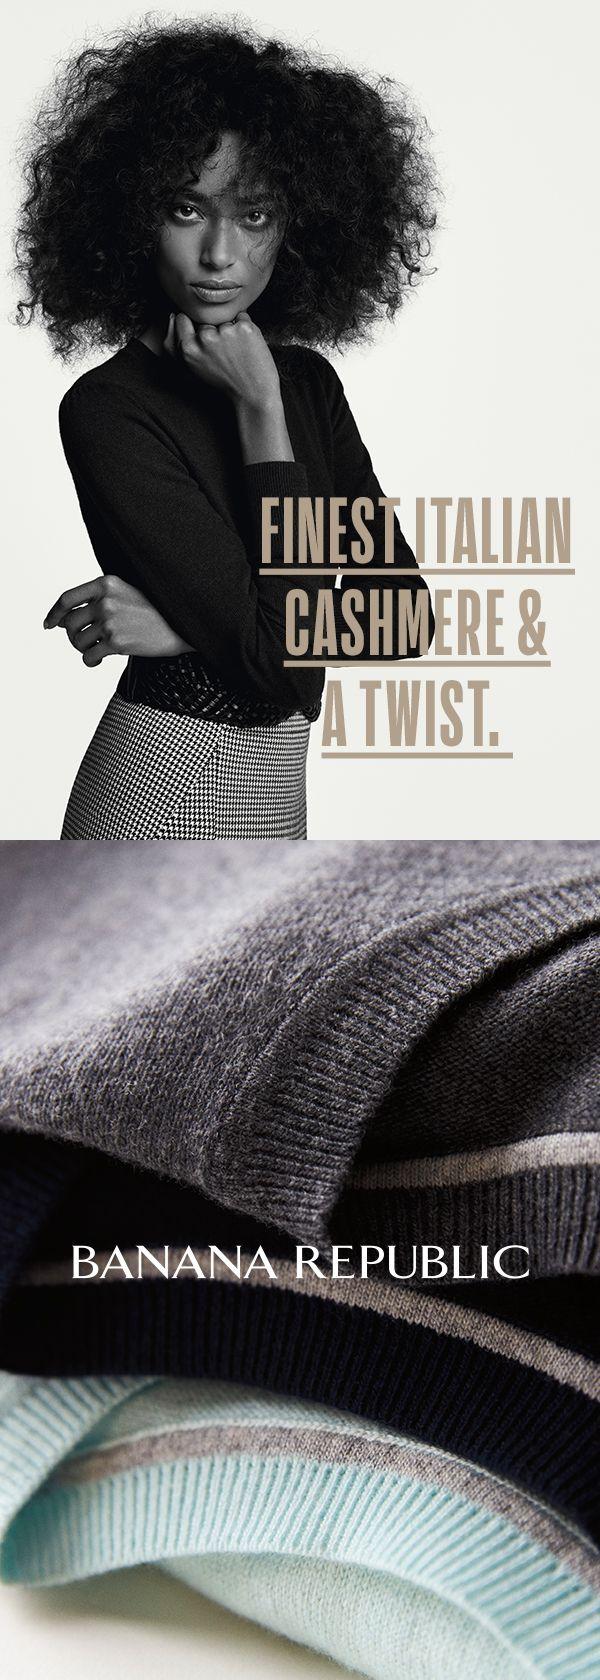 Best 13 Pixie Market ideas on Pinterest   Dress fashion, Cute ...